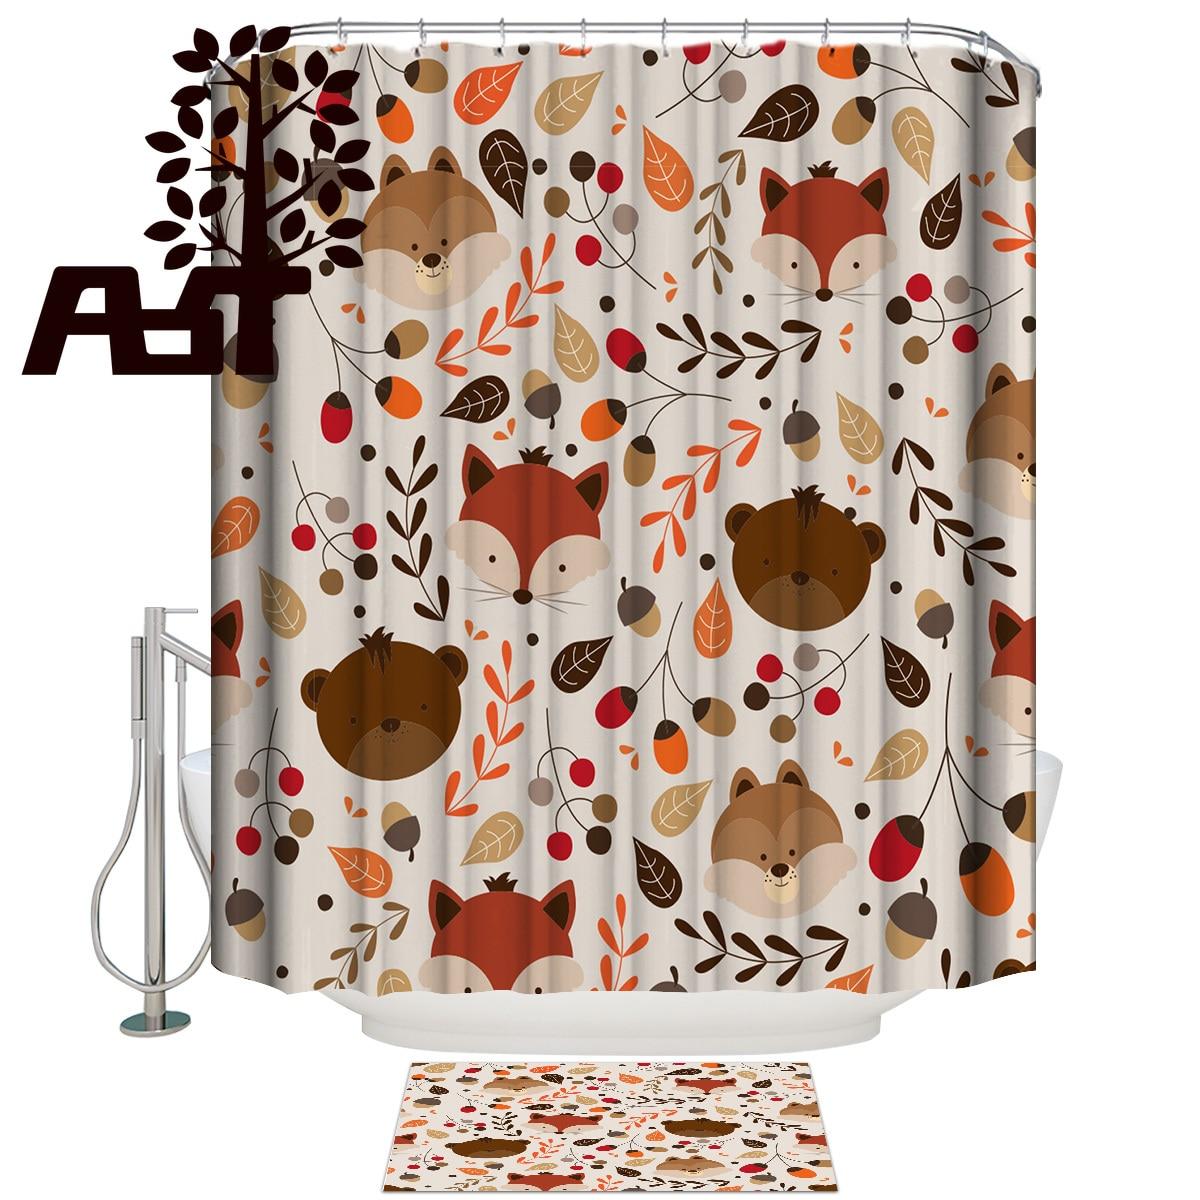 Tienda de arte dibujos animados zorro animales ducha cortina de baño establece con alfombras alfombra de baño con cortina de ducha al aire libre anillos modernos divertidos